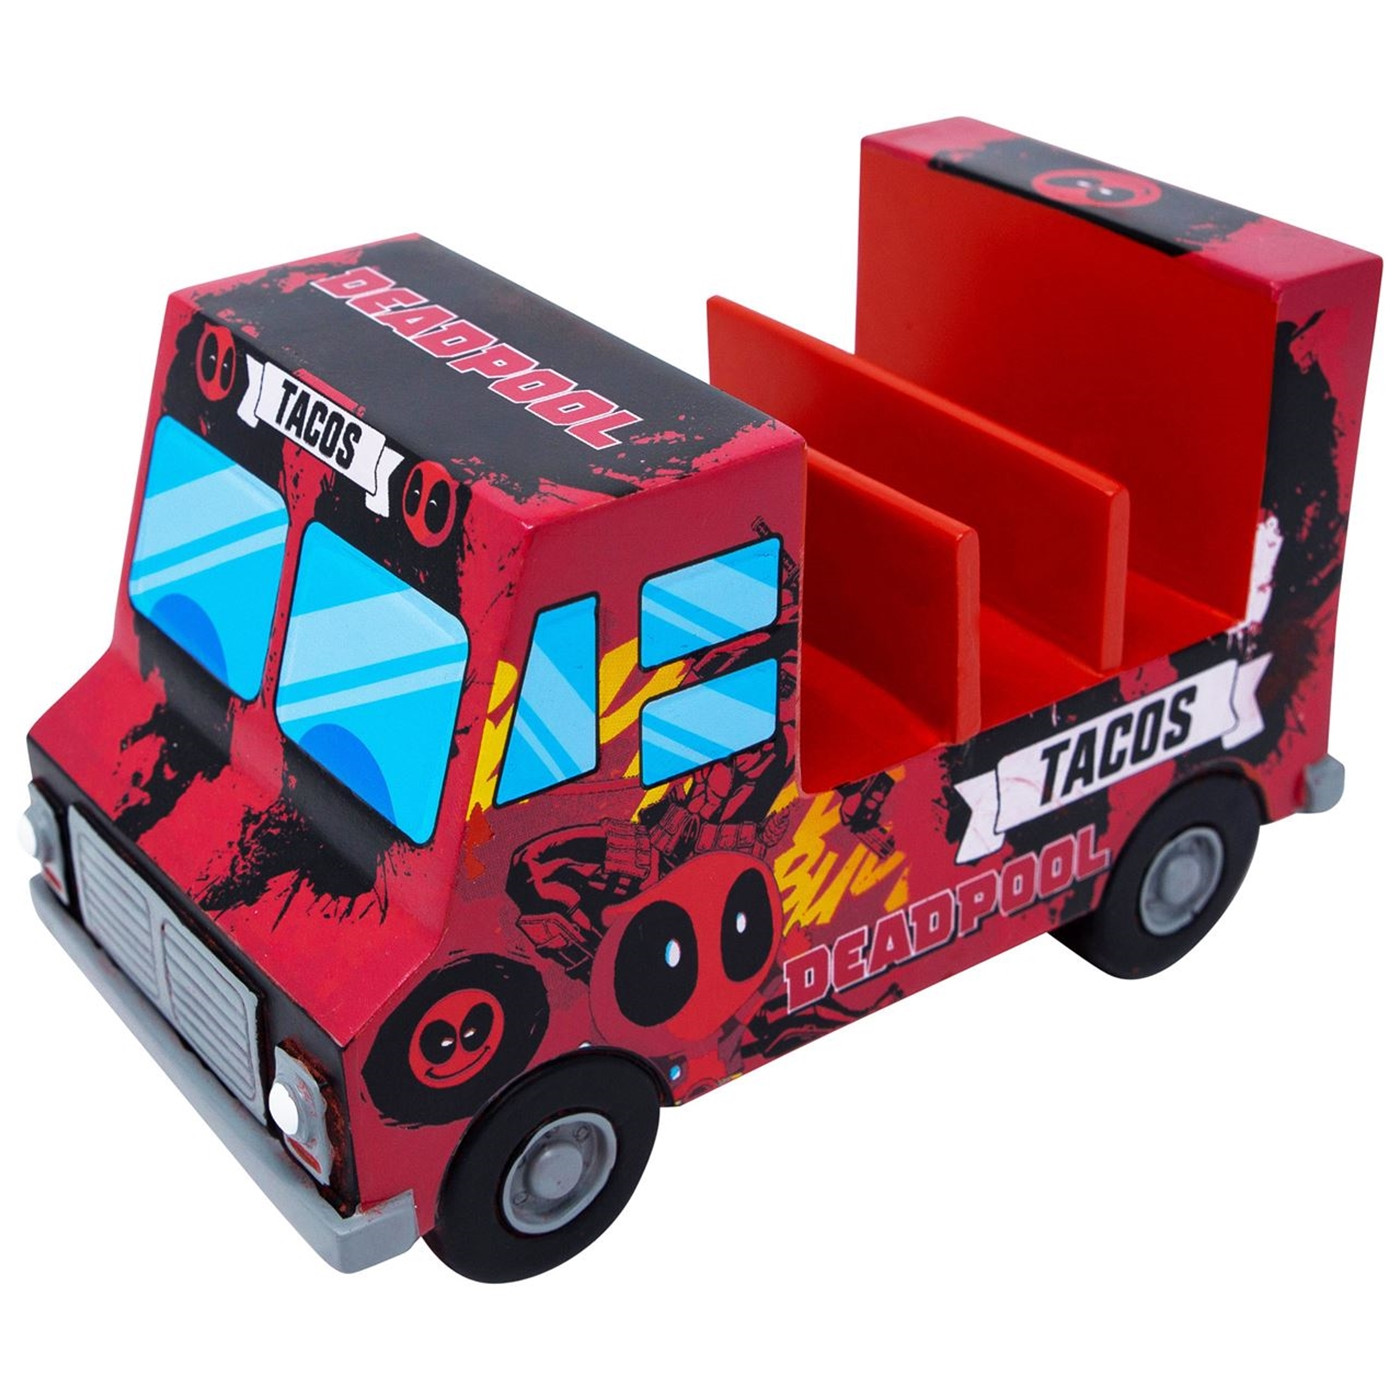 Deadpool Organizer Truck - Safe for Food or Whatever Else